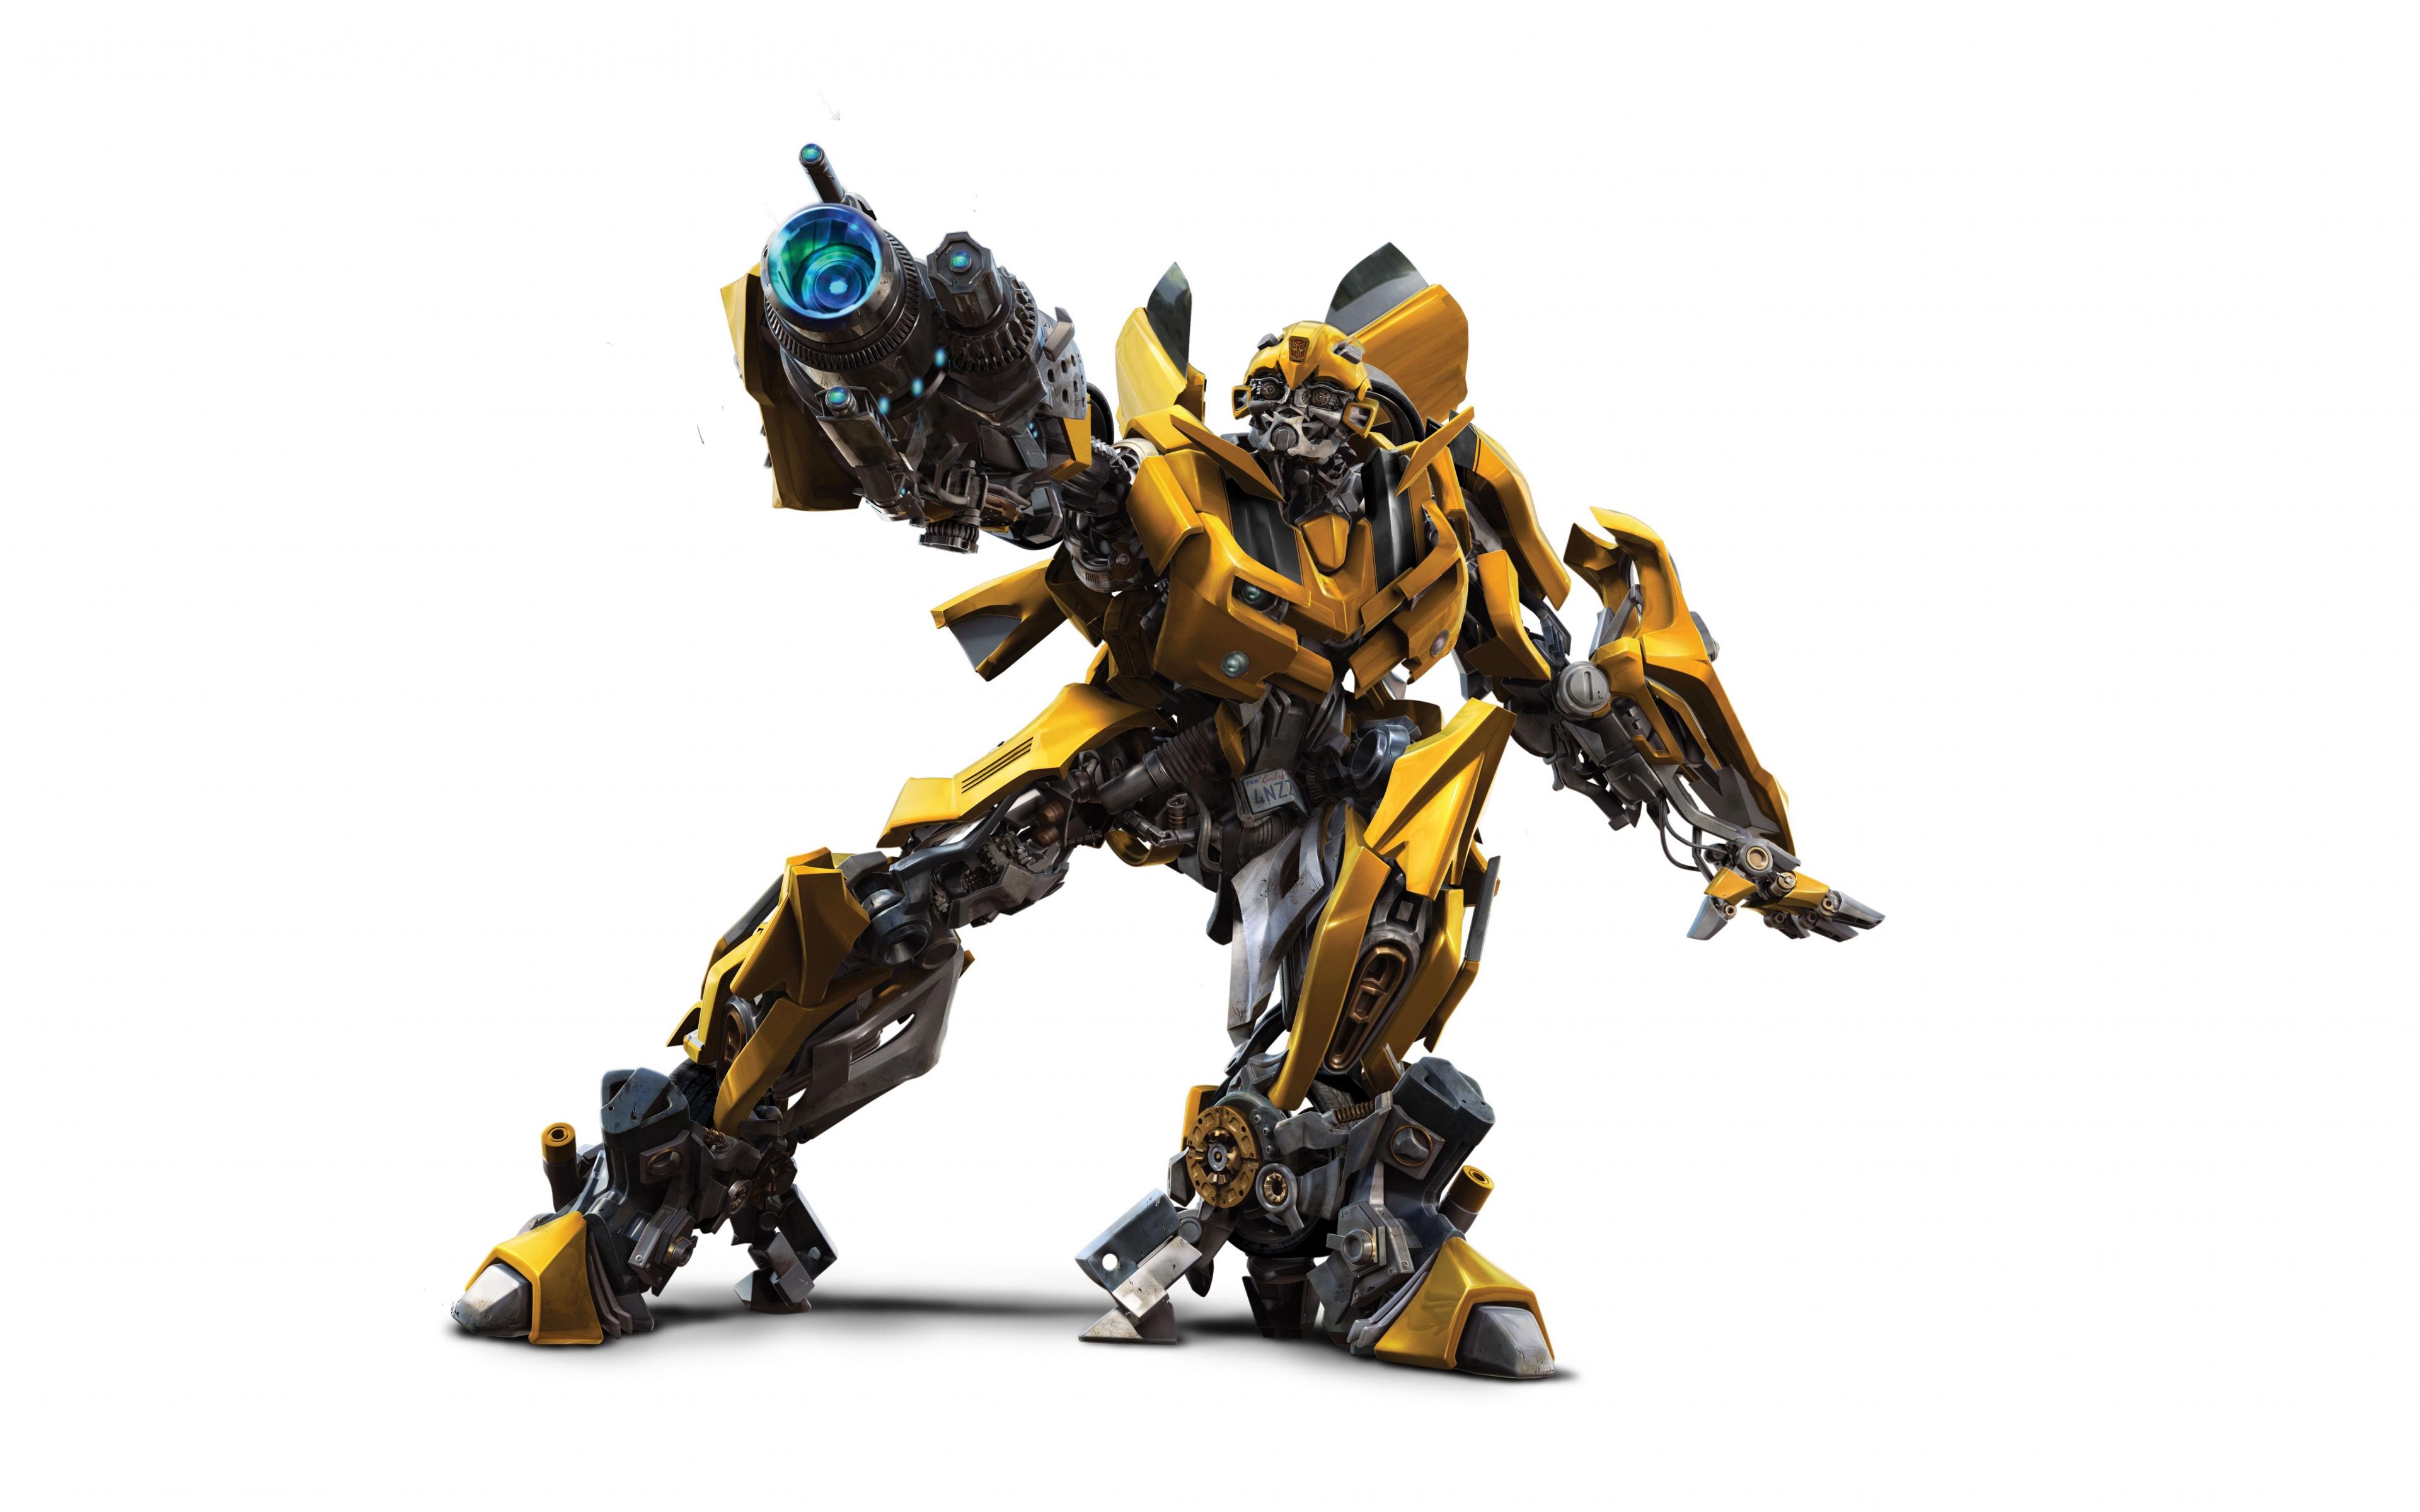 Download 3840x2400 Wallpaper Bumblebee 2018 Movie Car Robot 4k